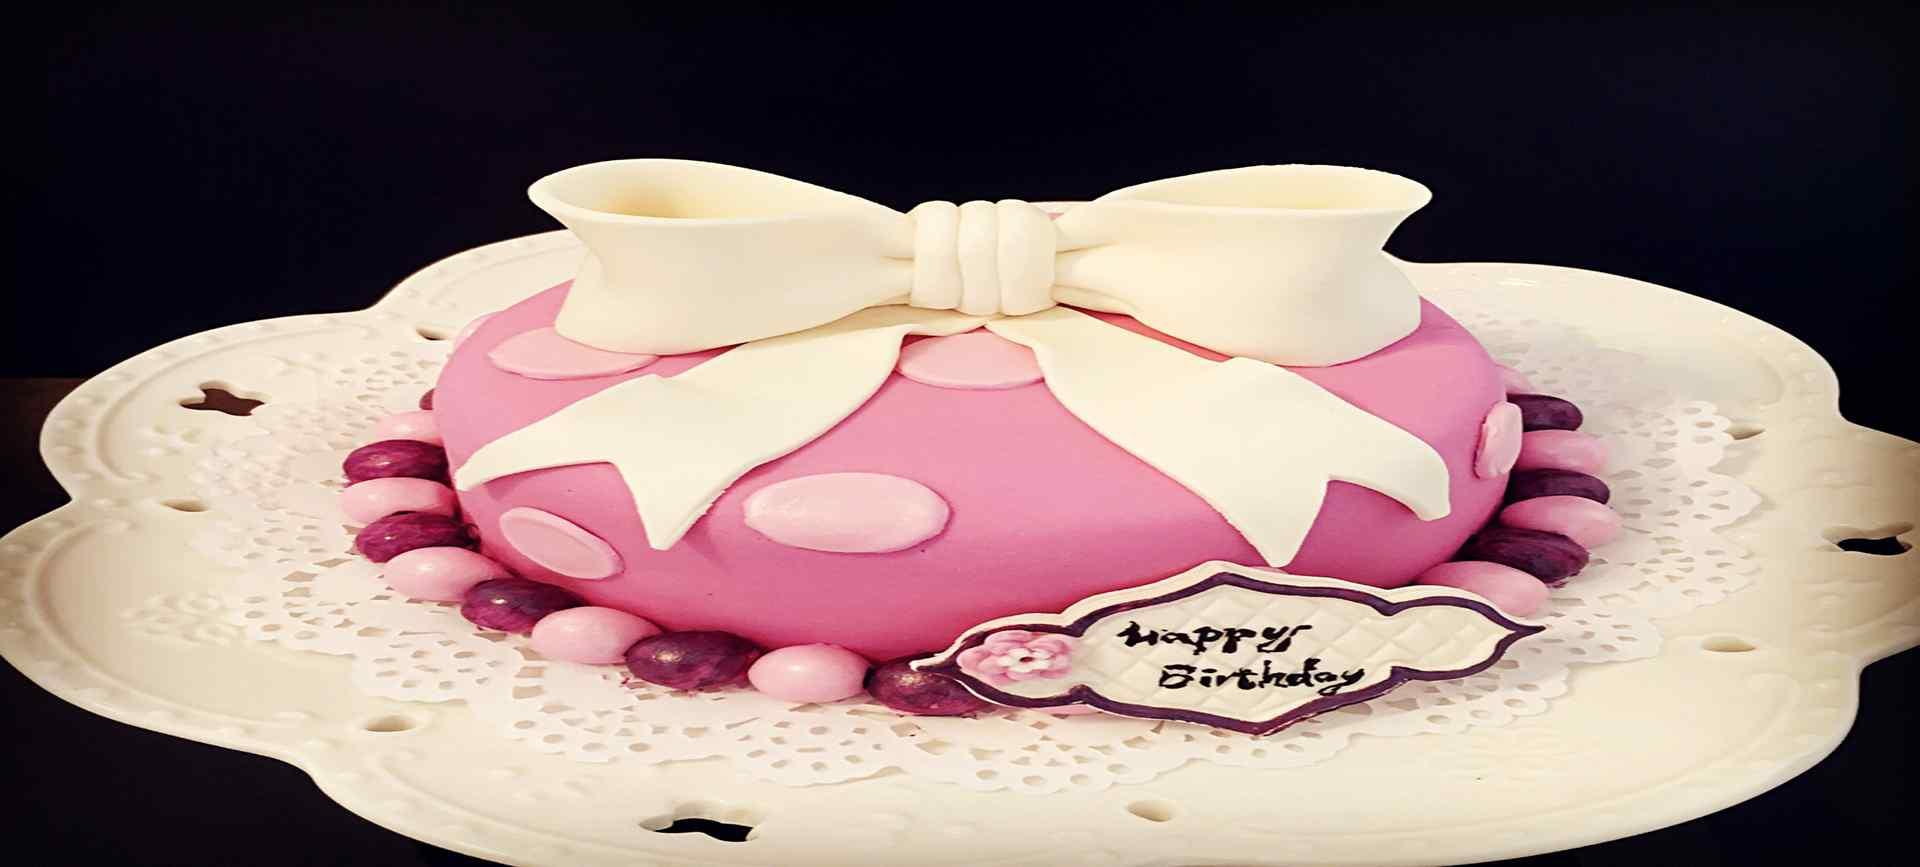 翻糖蛋糕_翻糖蛋糕图片_翻糖蛋糕可爱_翻糖蛋糕美食壁纸